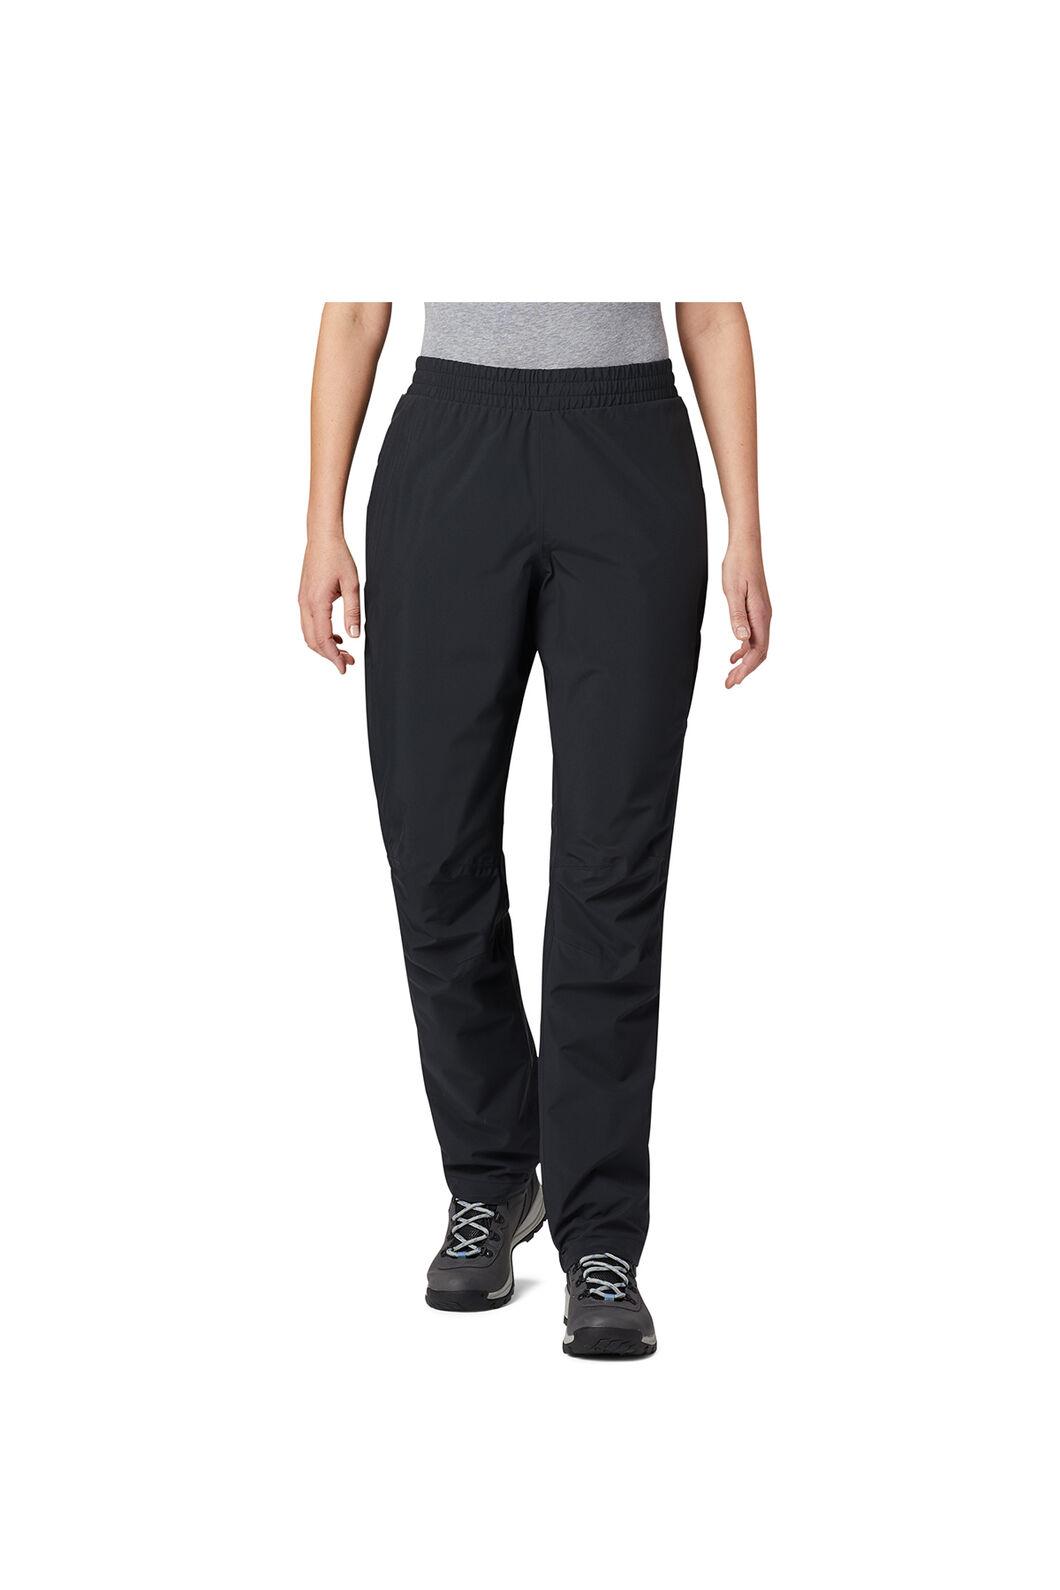 Columbia Evolution Valley Pants — Women's, Black, hi-res